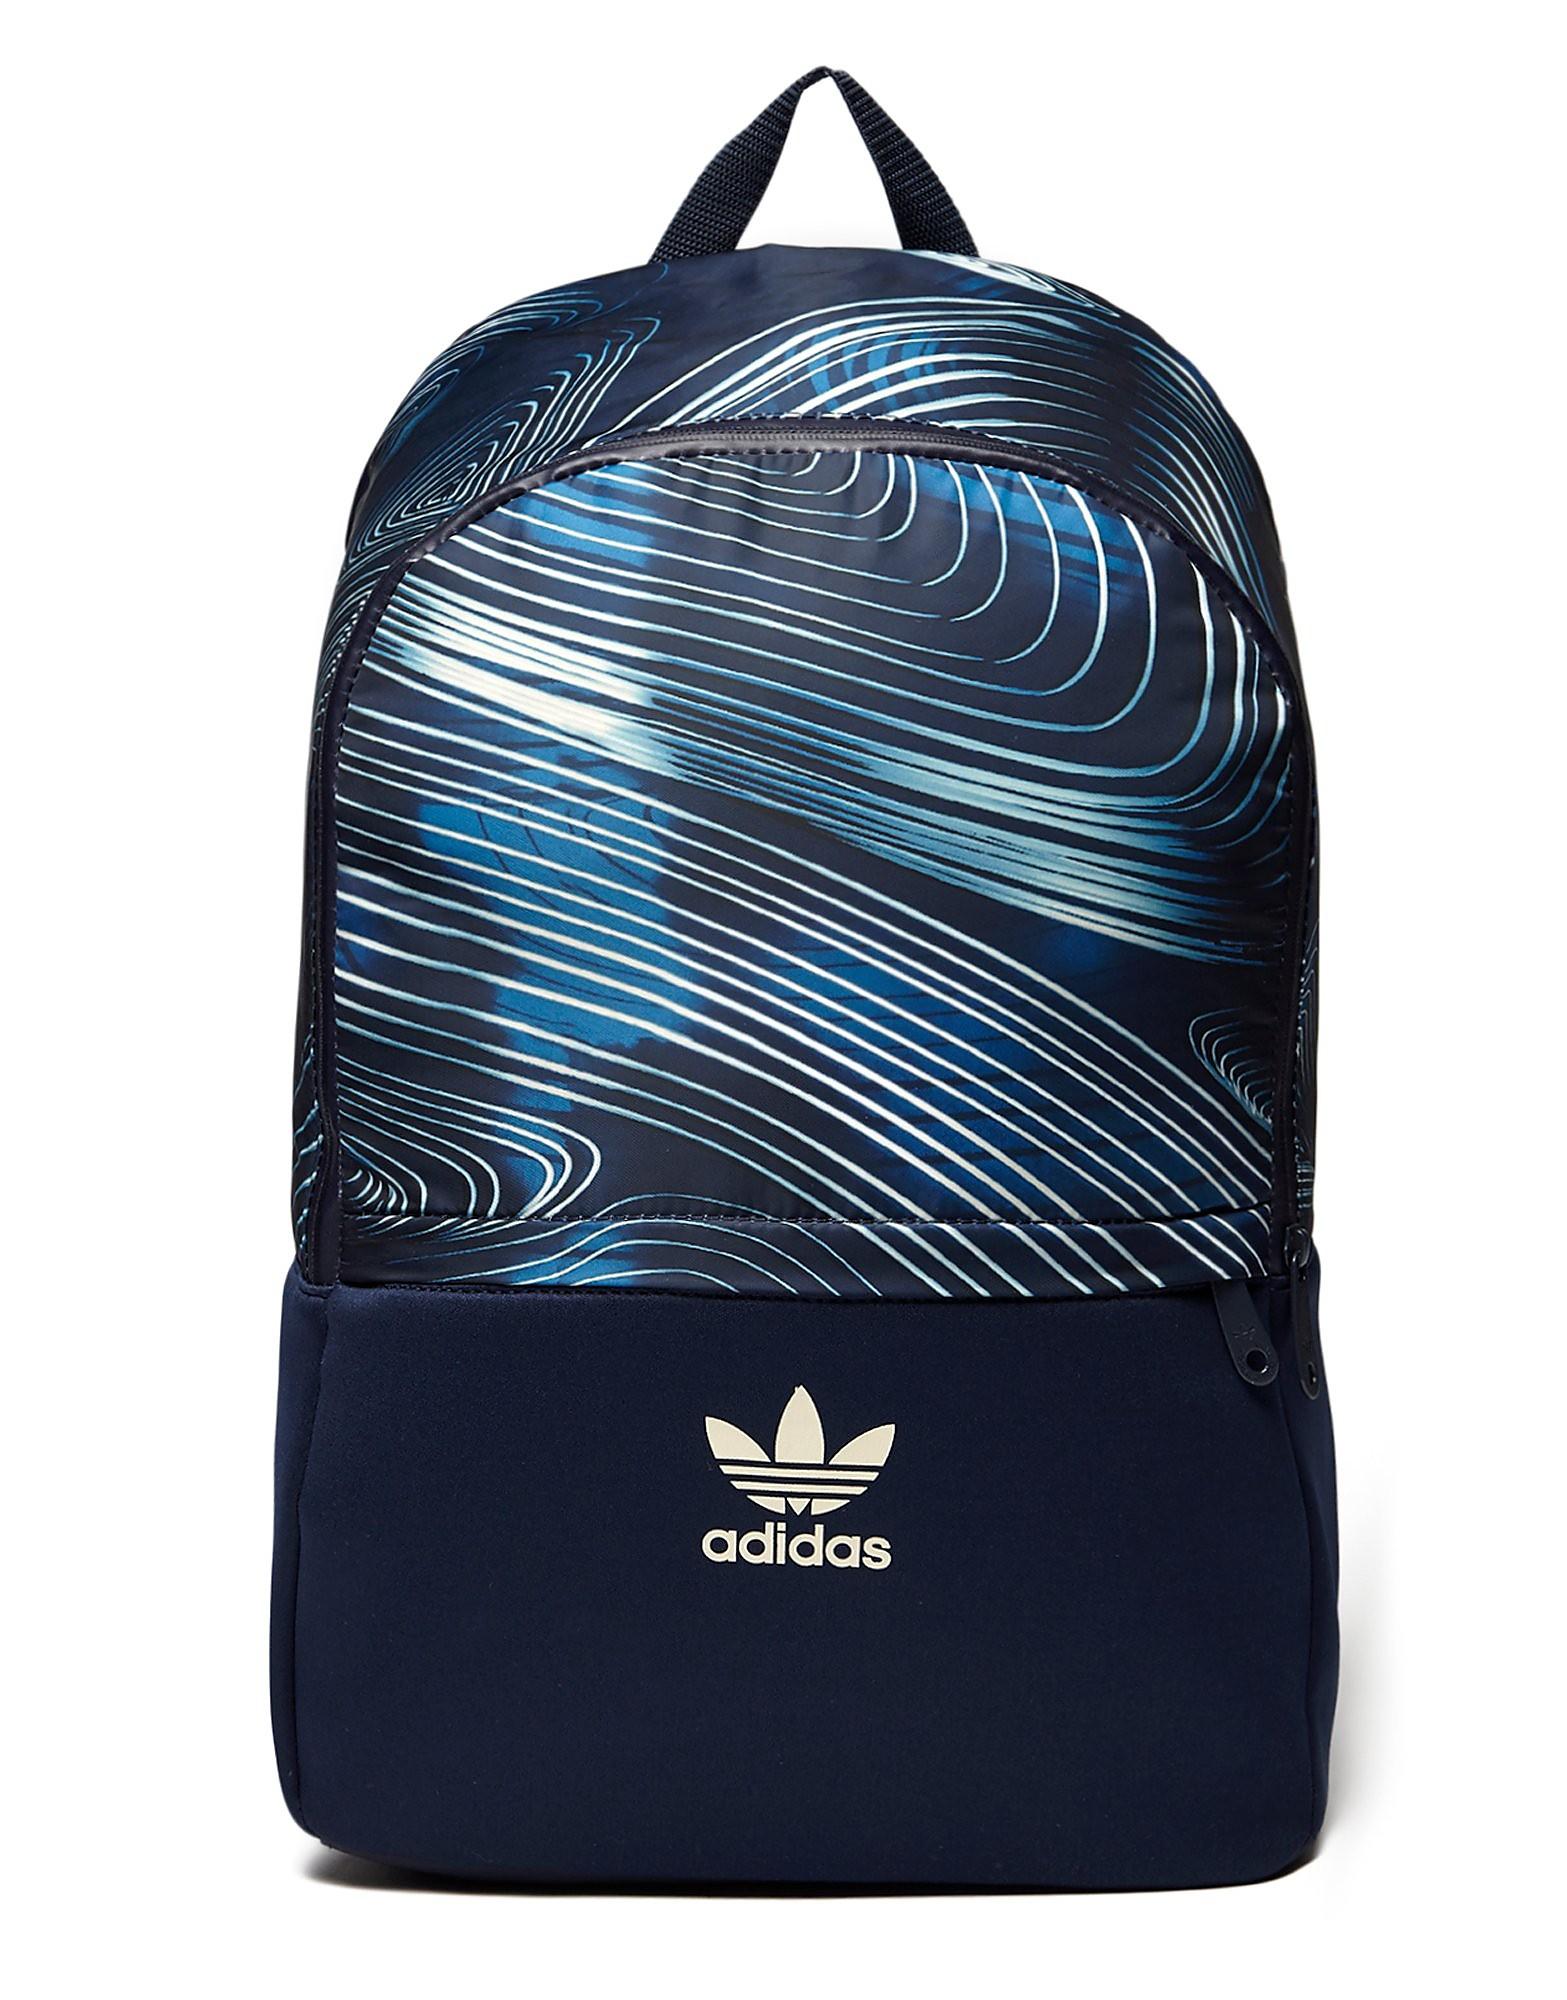 adidas Originals Essentials Geology Backpack